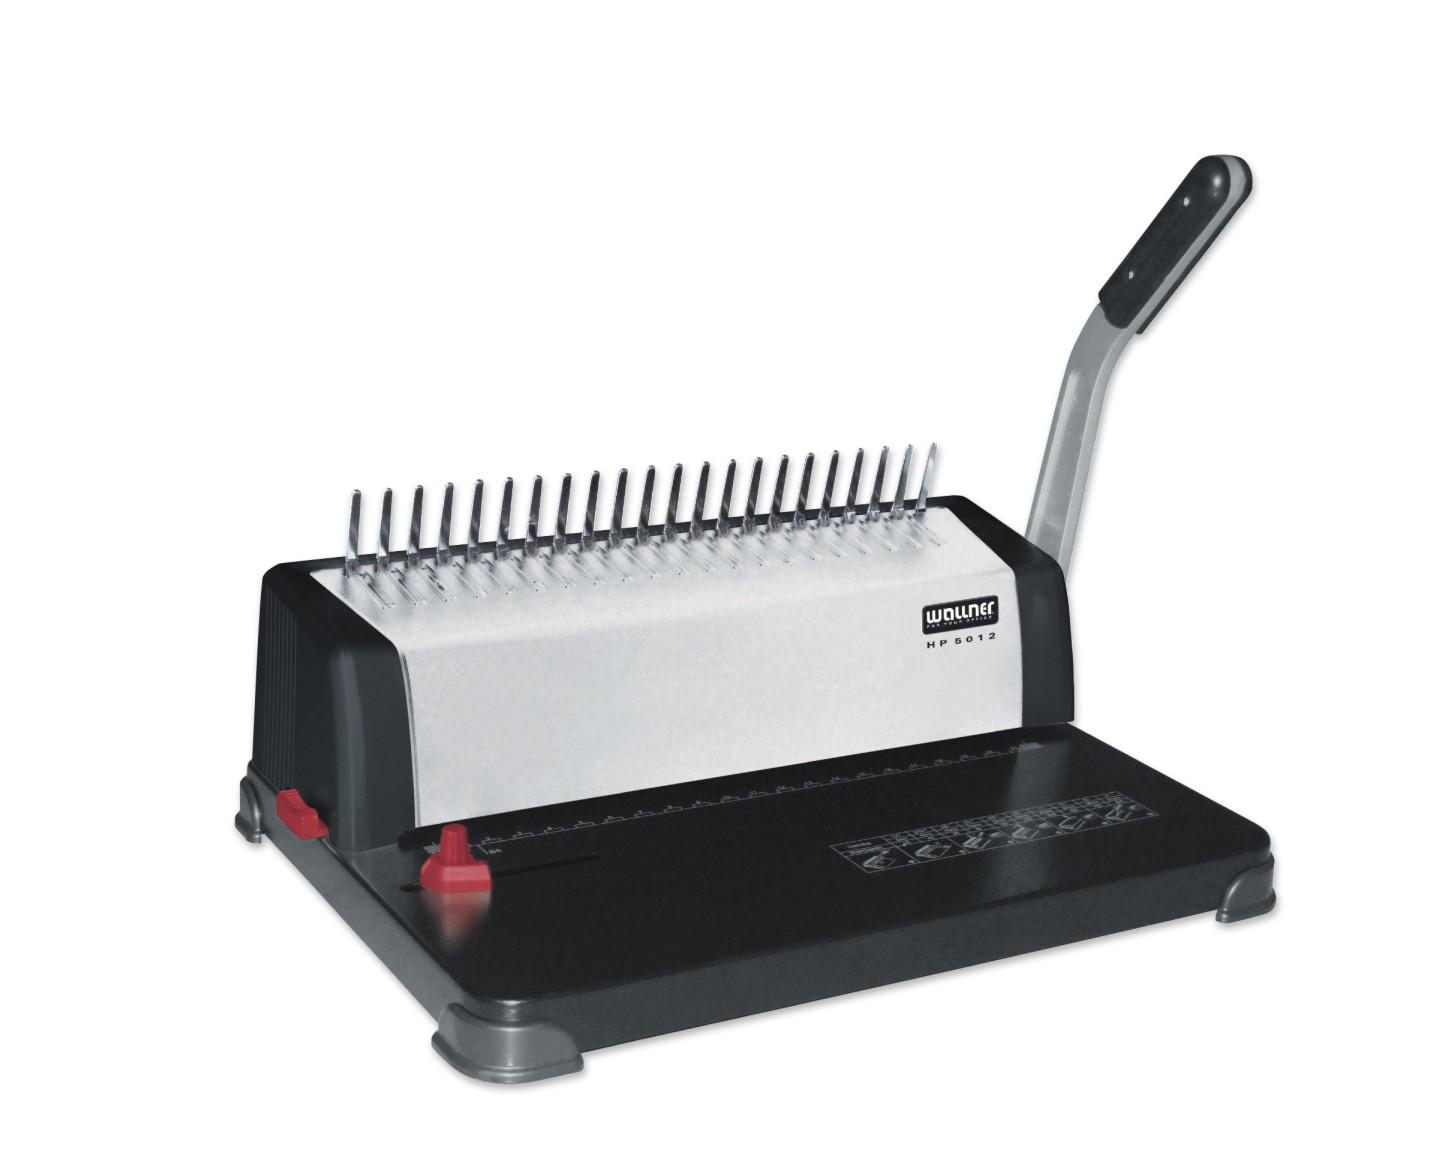 Vazač HP 5012